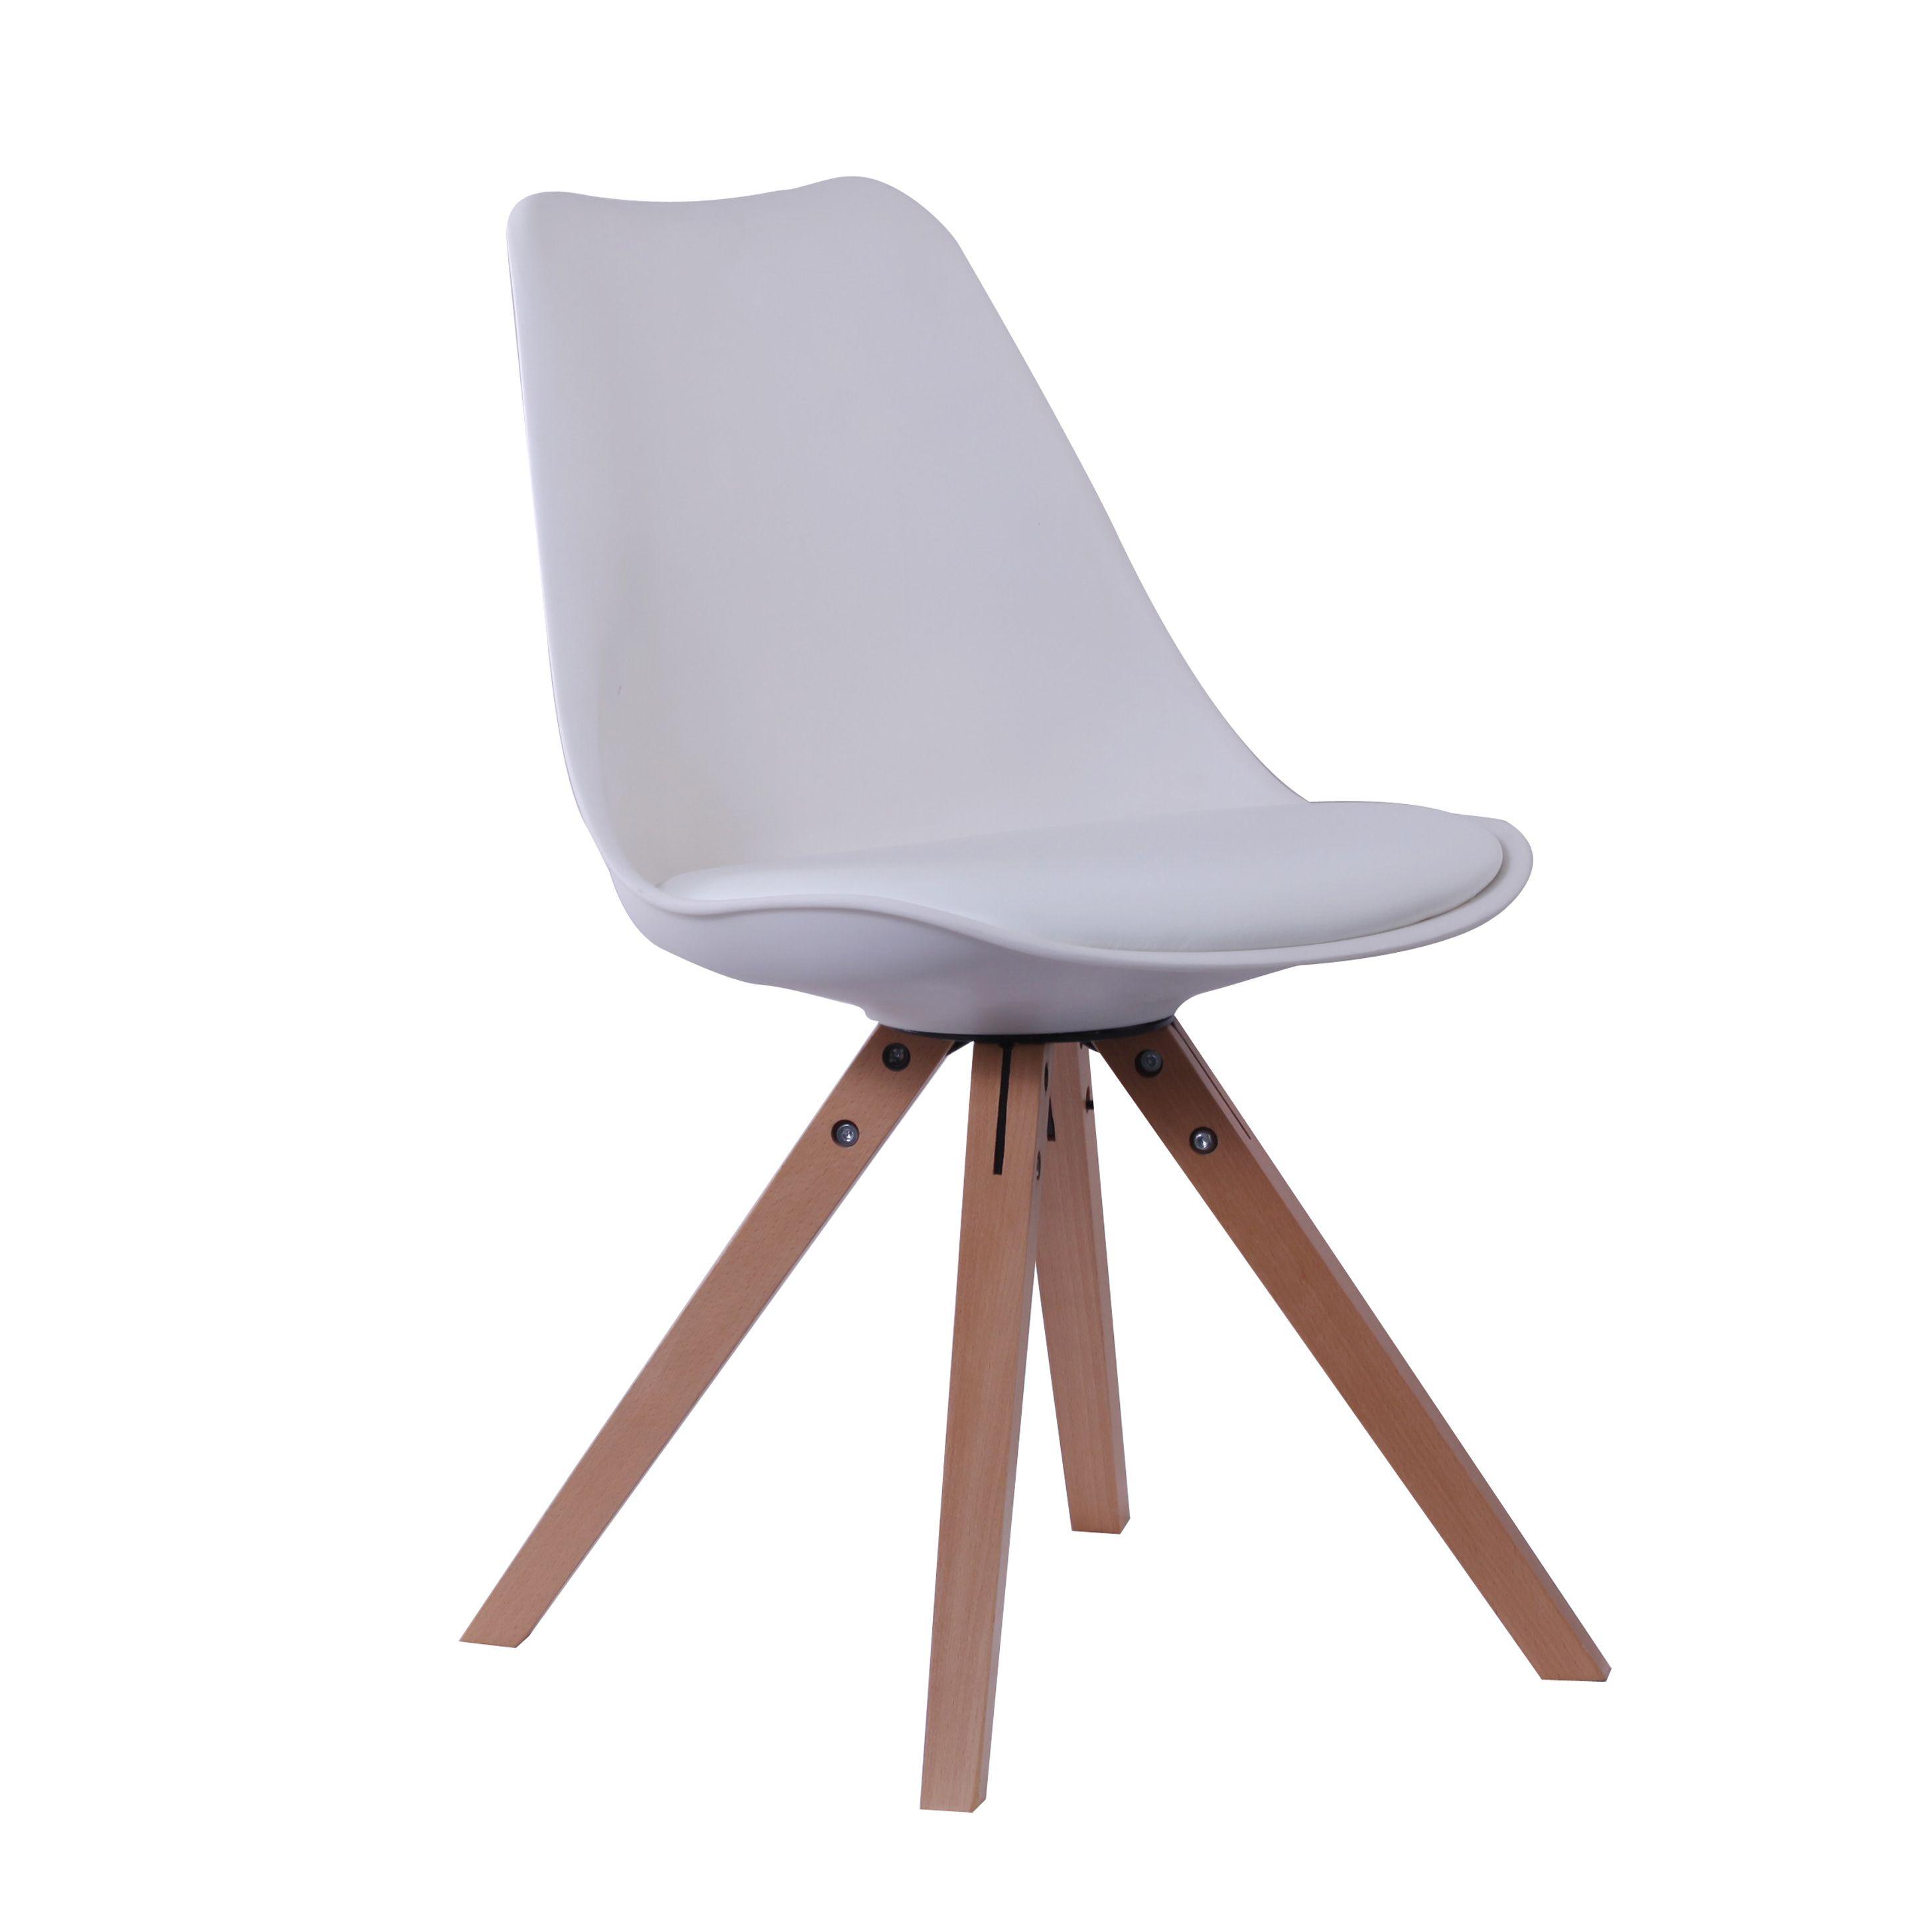 Silla nórdica con patas de madera #silla #salon #casa #versa | White ...